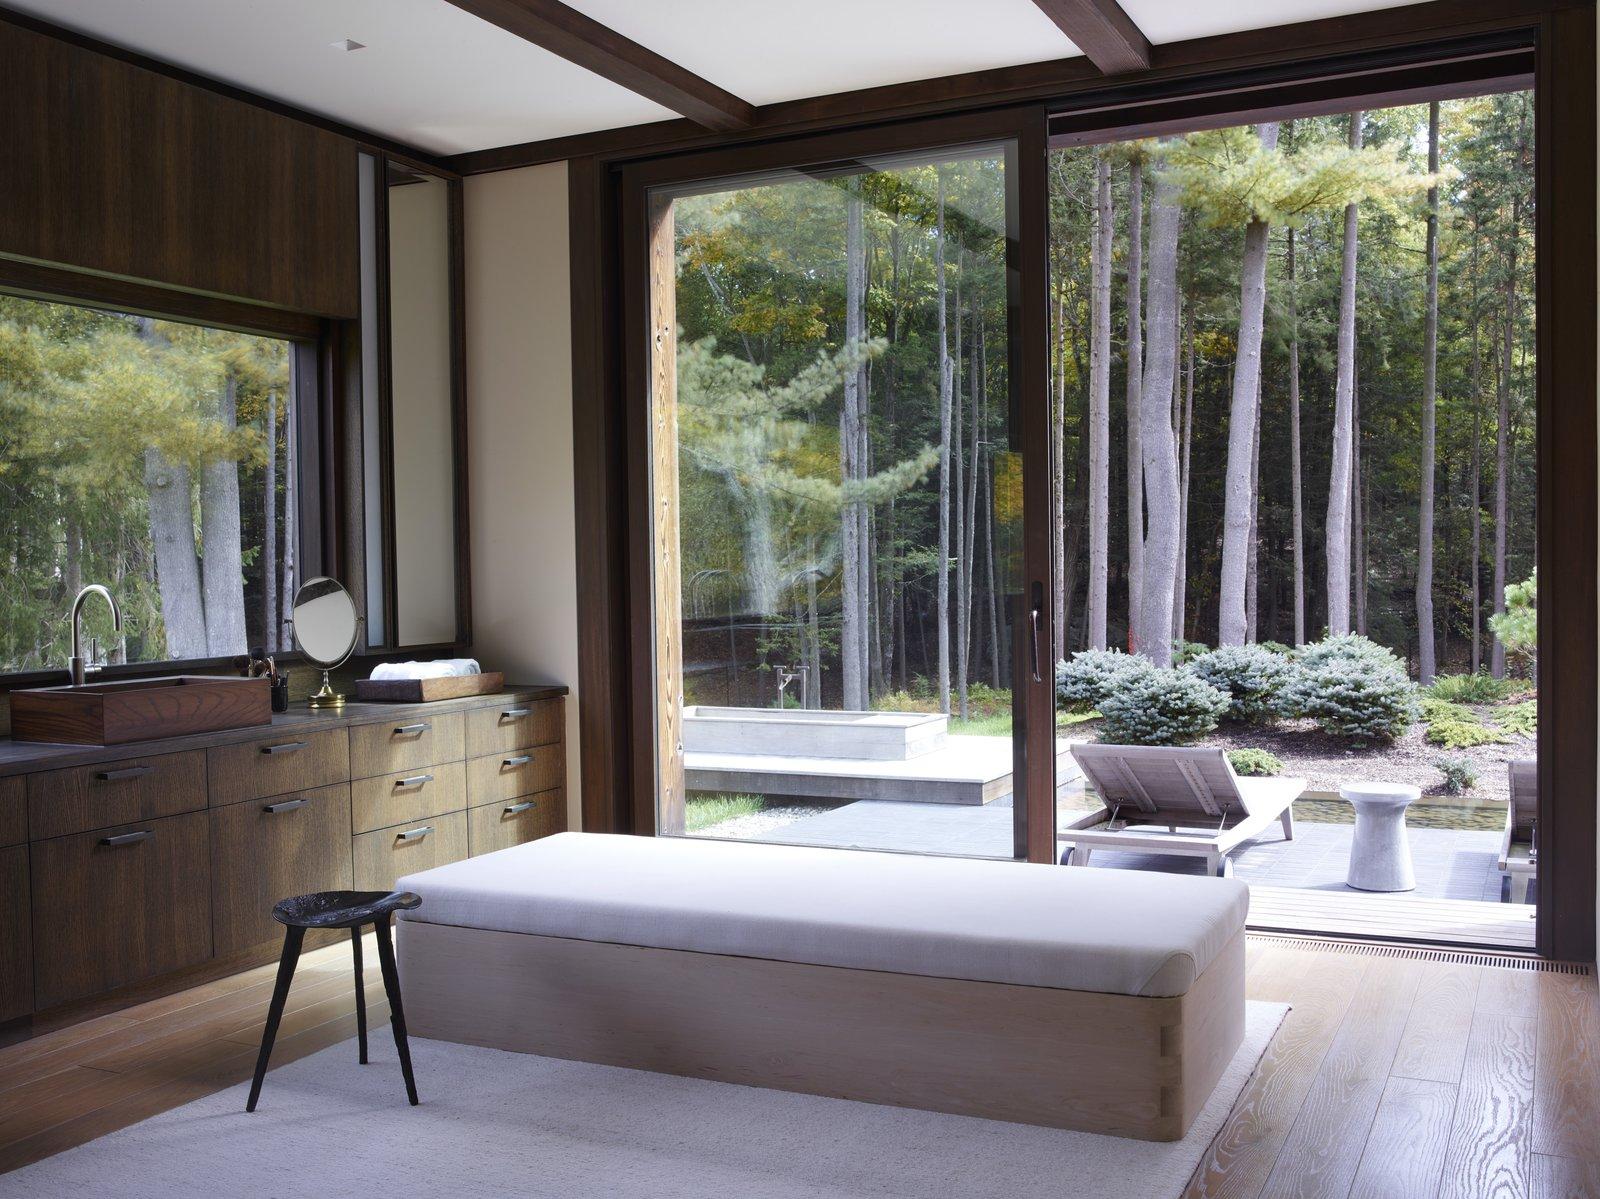 Bath Room, Wood Counter, Recessed Lighting, Medium Hardwood Floor, Vessel Sink, and Ceiling Lighting  Photo 15 of 15 in Feast Your Eyes on Fashion Designer Josie Natori's Japanese-Inspired Home